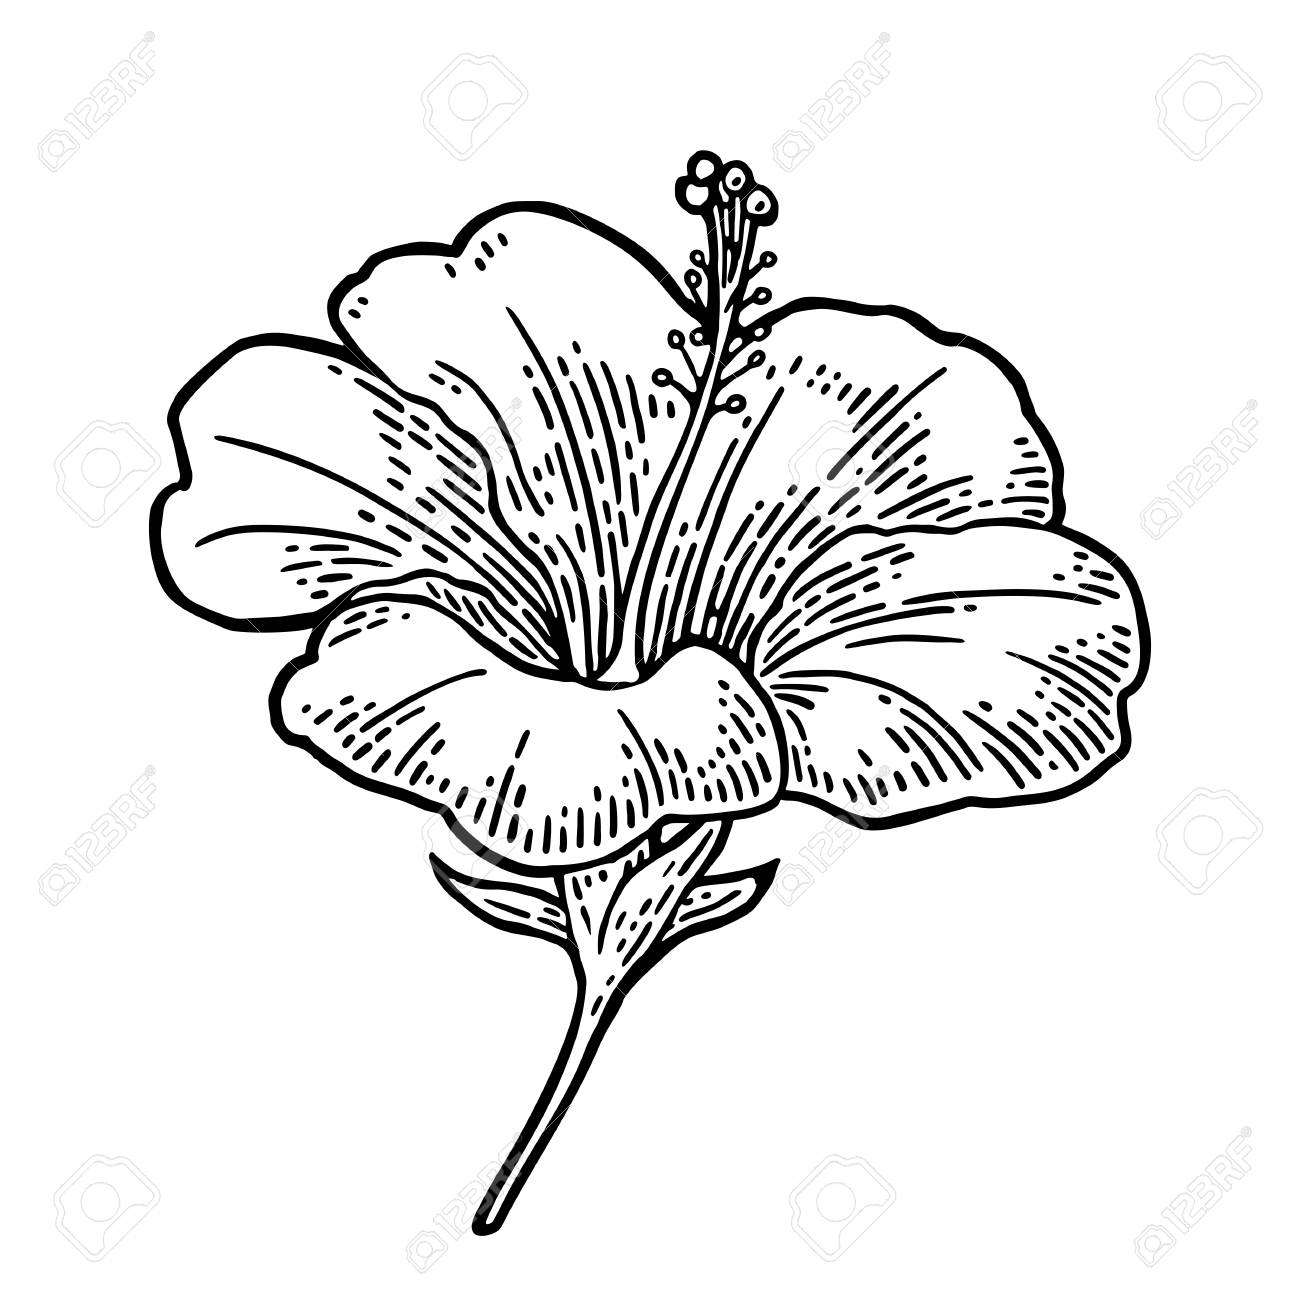 Hibiscus Flower Black Engraving Vintage Illustration Isolated